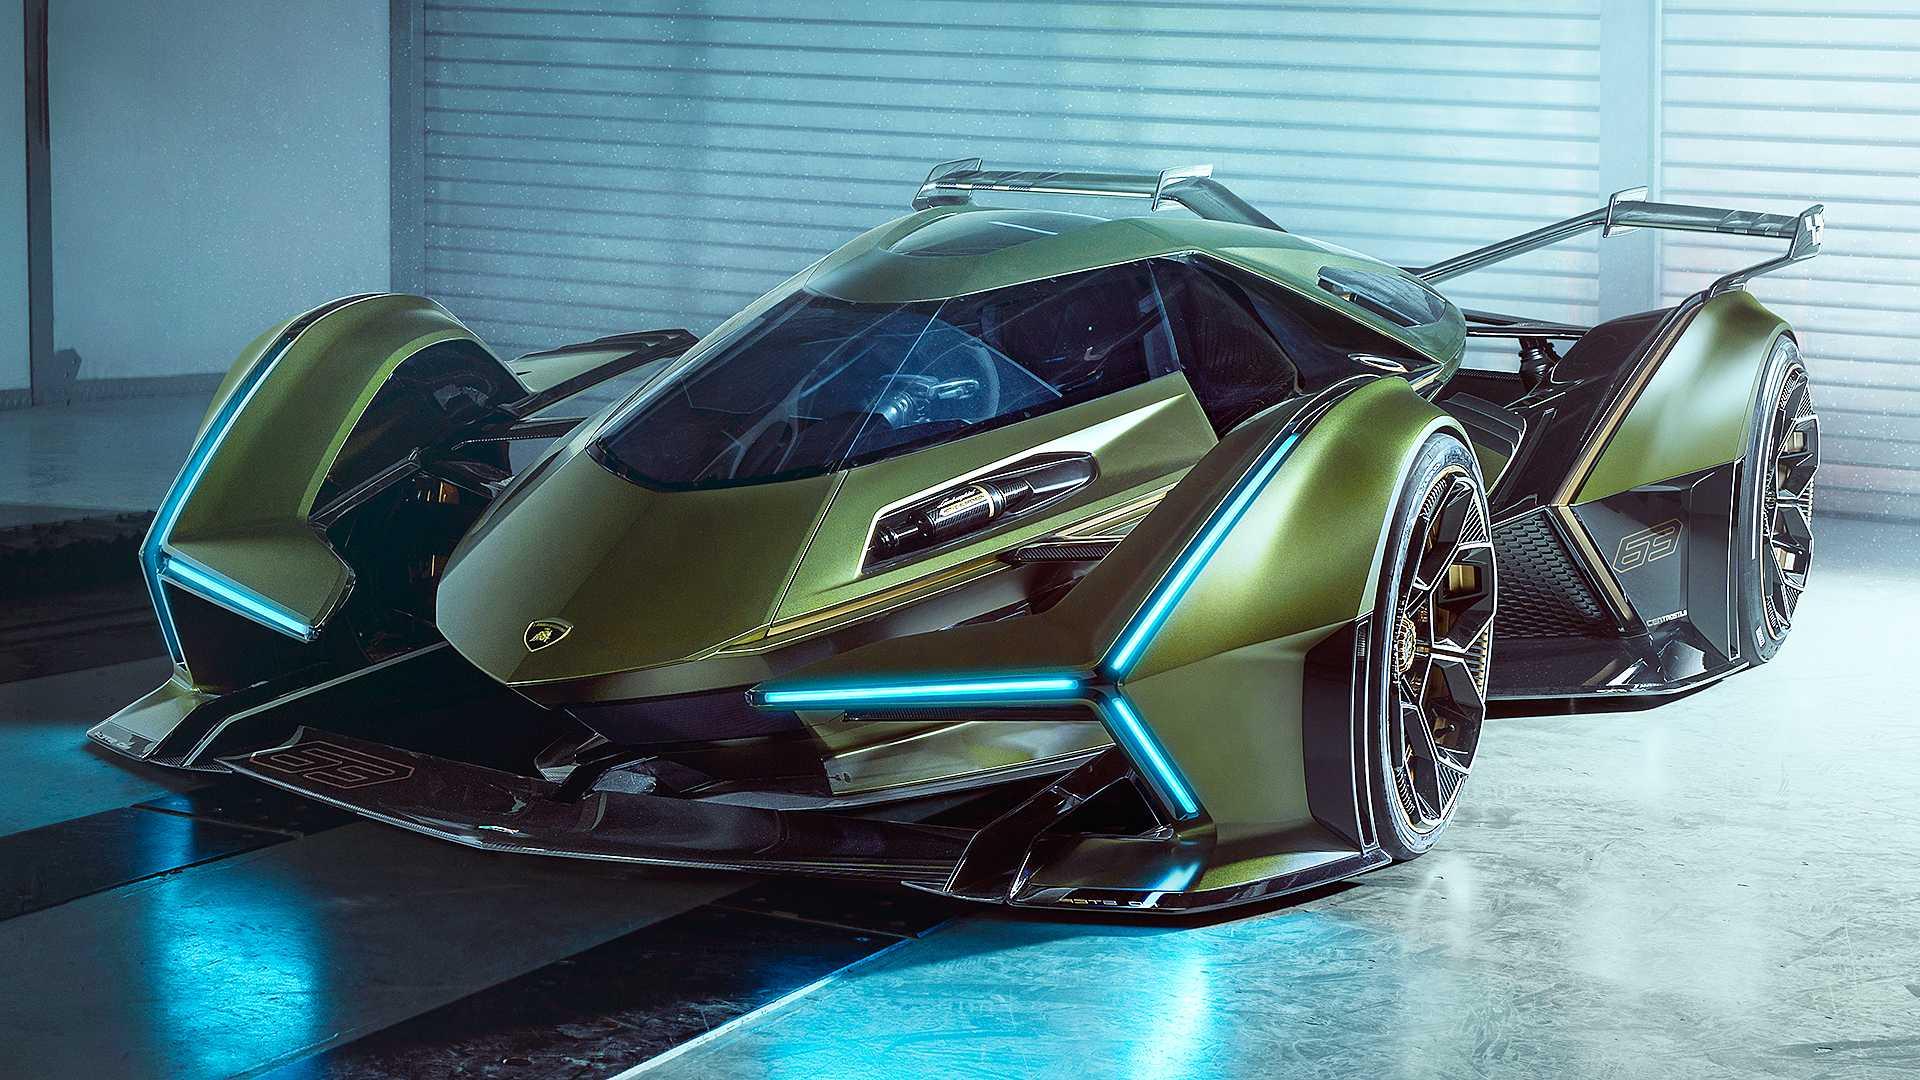 Lamborghini-V12-Vision-Gran-Turismo-1